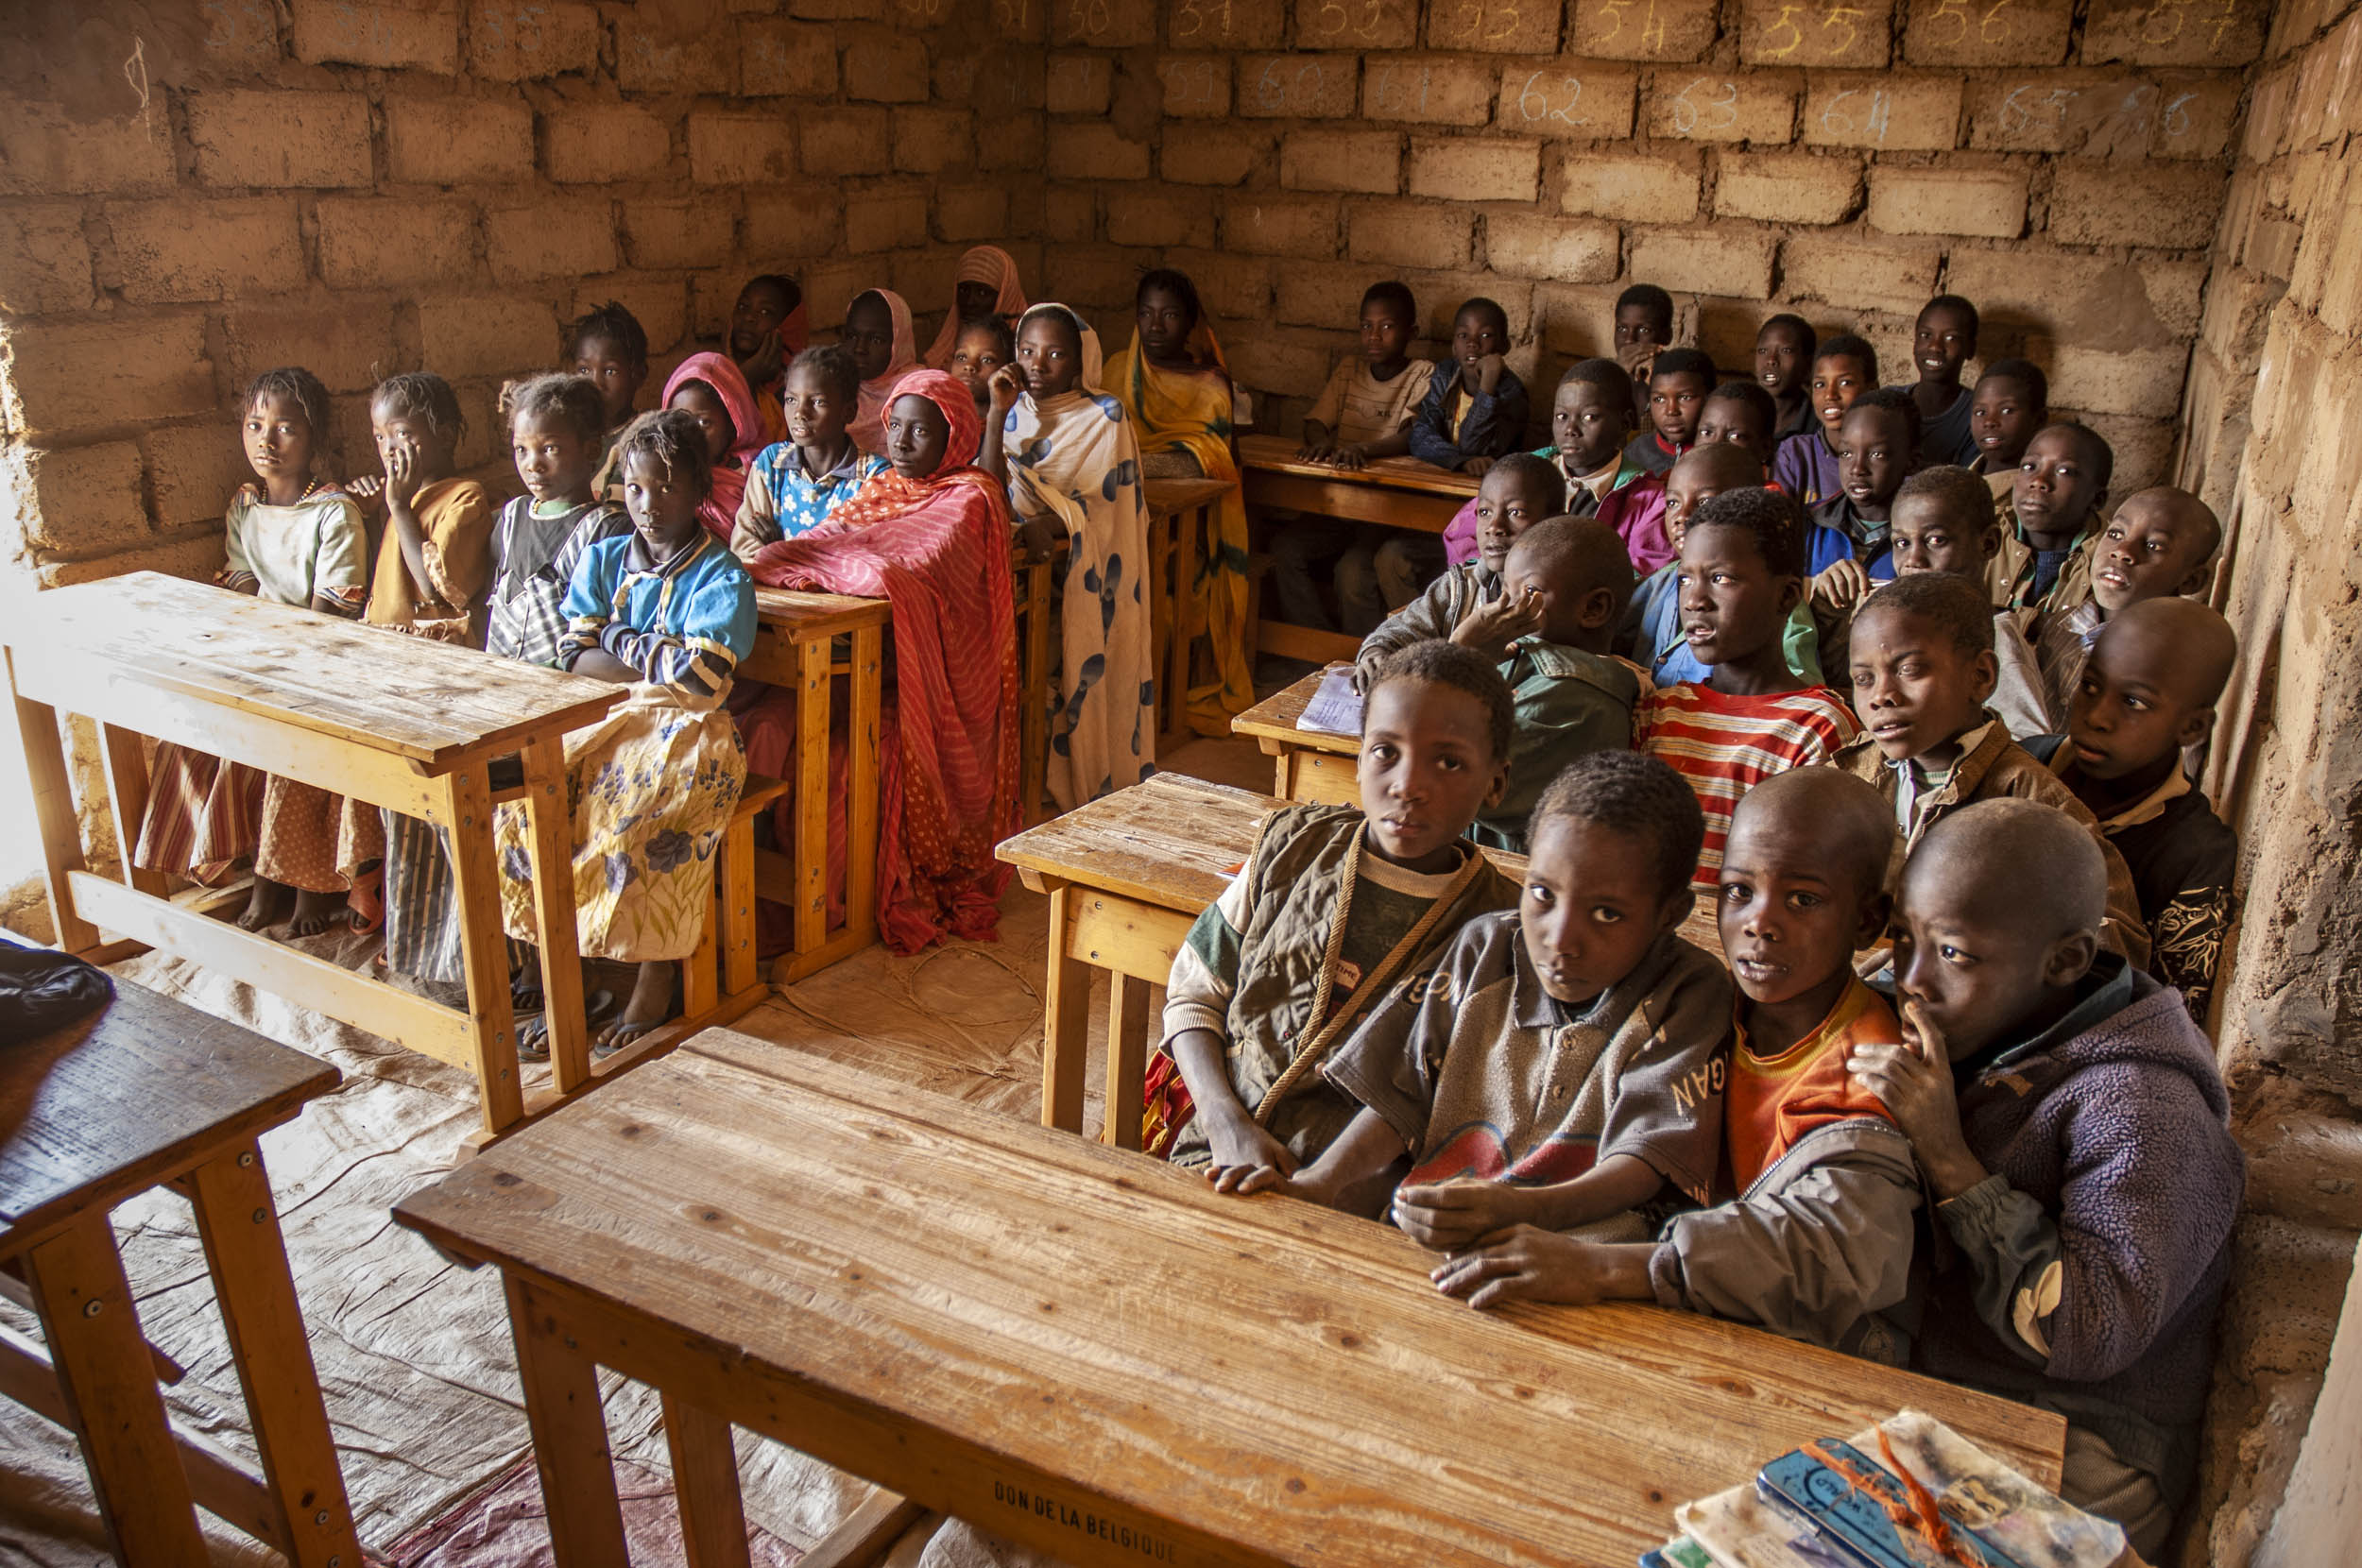 Escuela, Mauritania - Ethnoland - Hector Garrido, Aerial and human photography